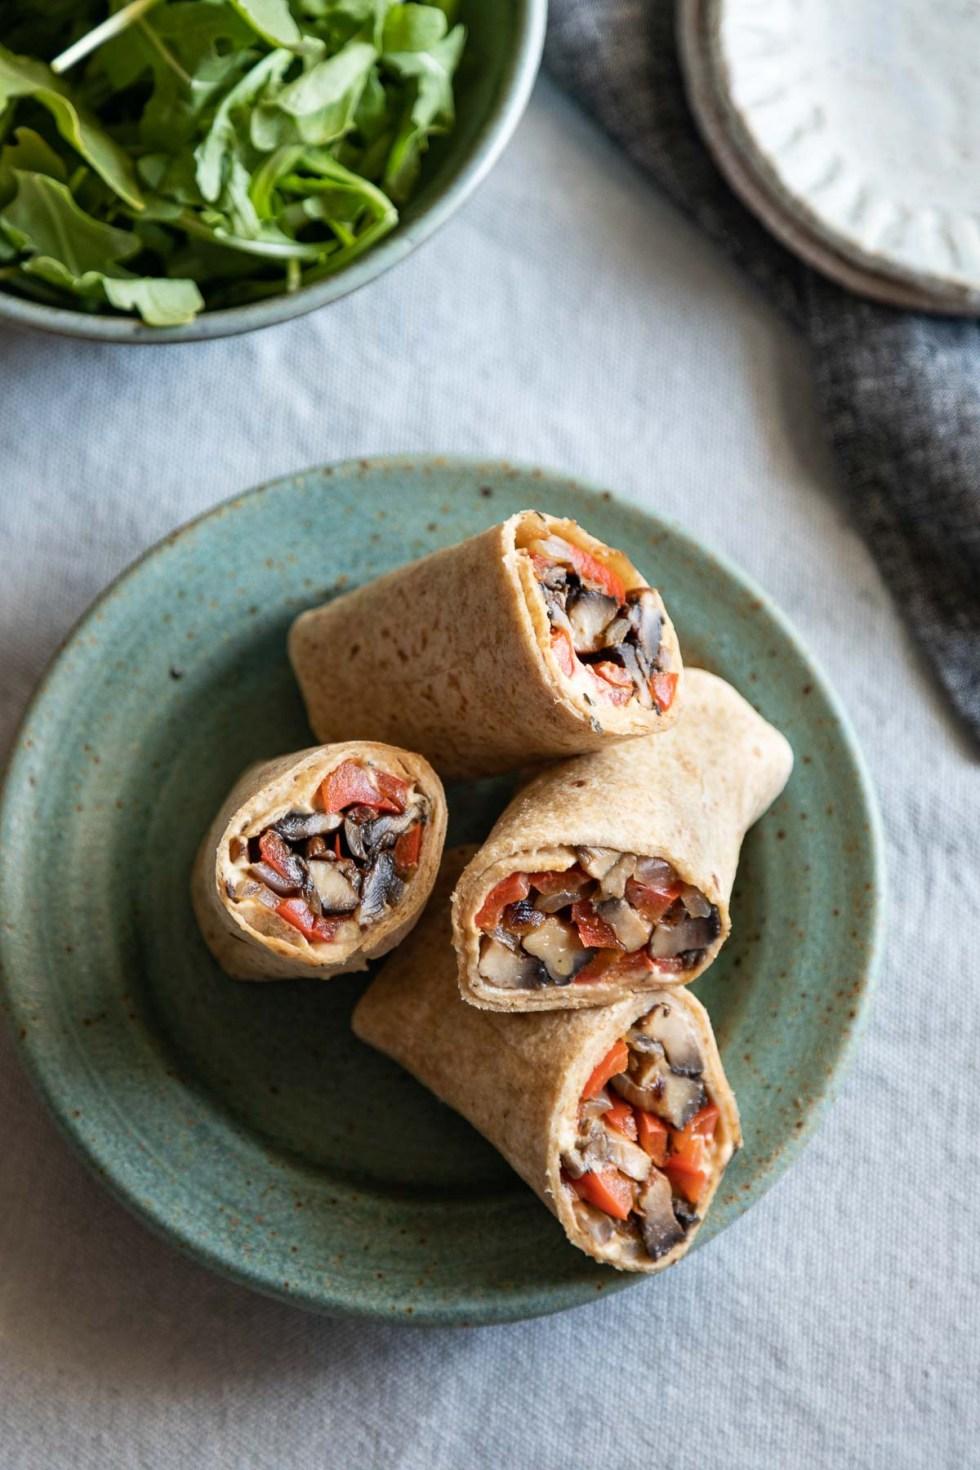 Hummus Wrap with roasted veggies